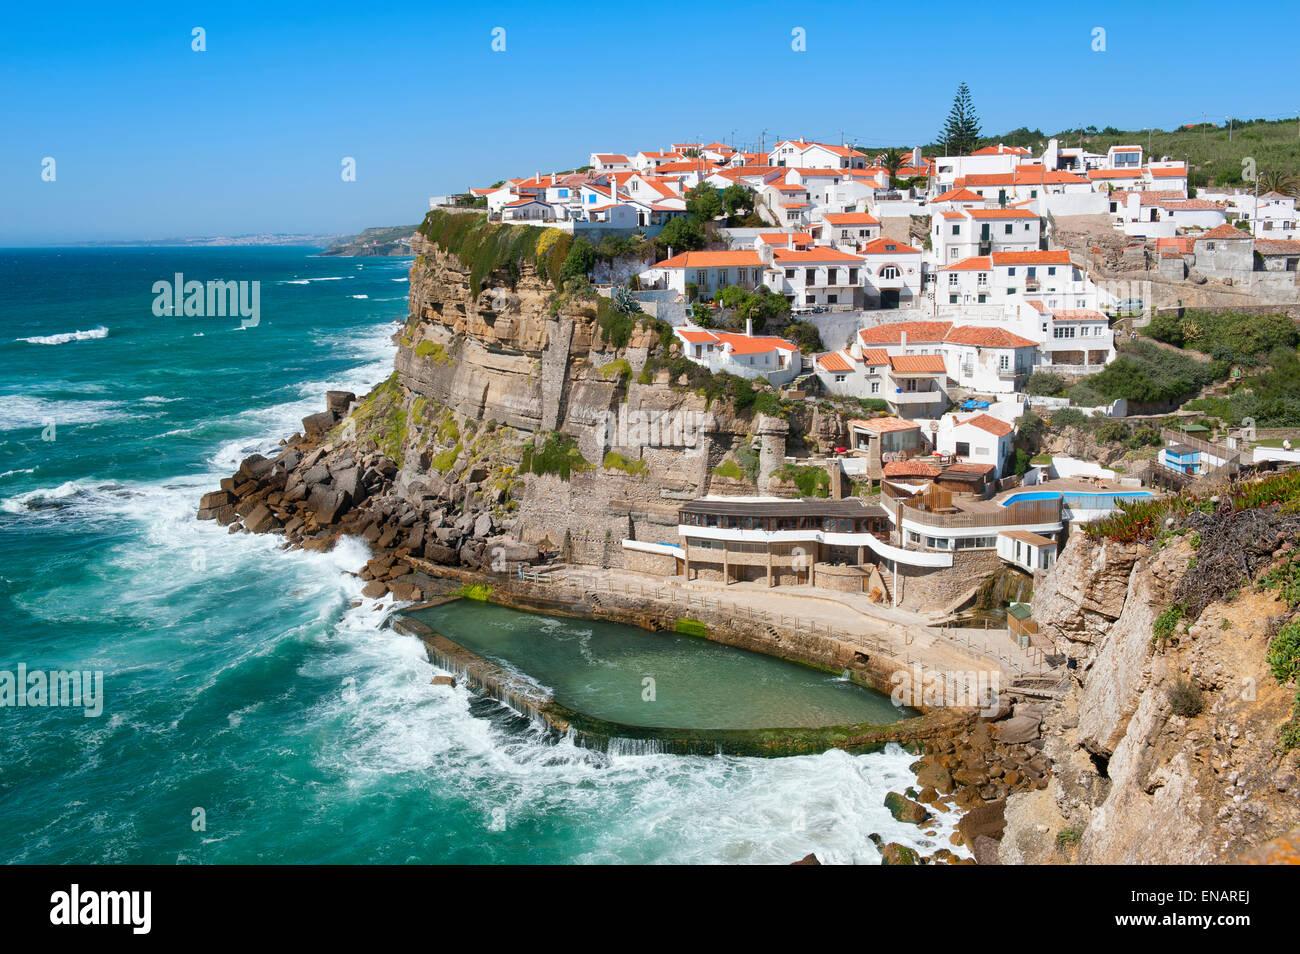 a16bca41734a9 Natural pool, Azenhas do Mar, Lisbon Coast, Portugal Natürlicher Pool,  Azenhas do Mar, Lissabon Küste, Portugal